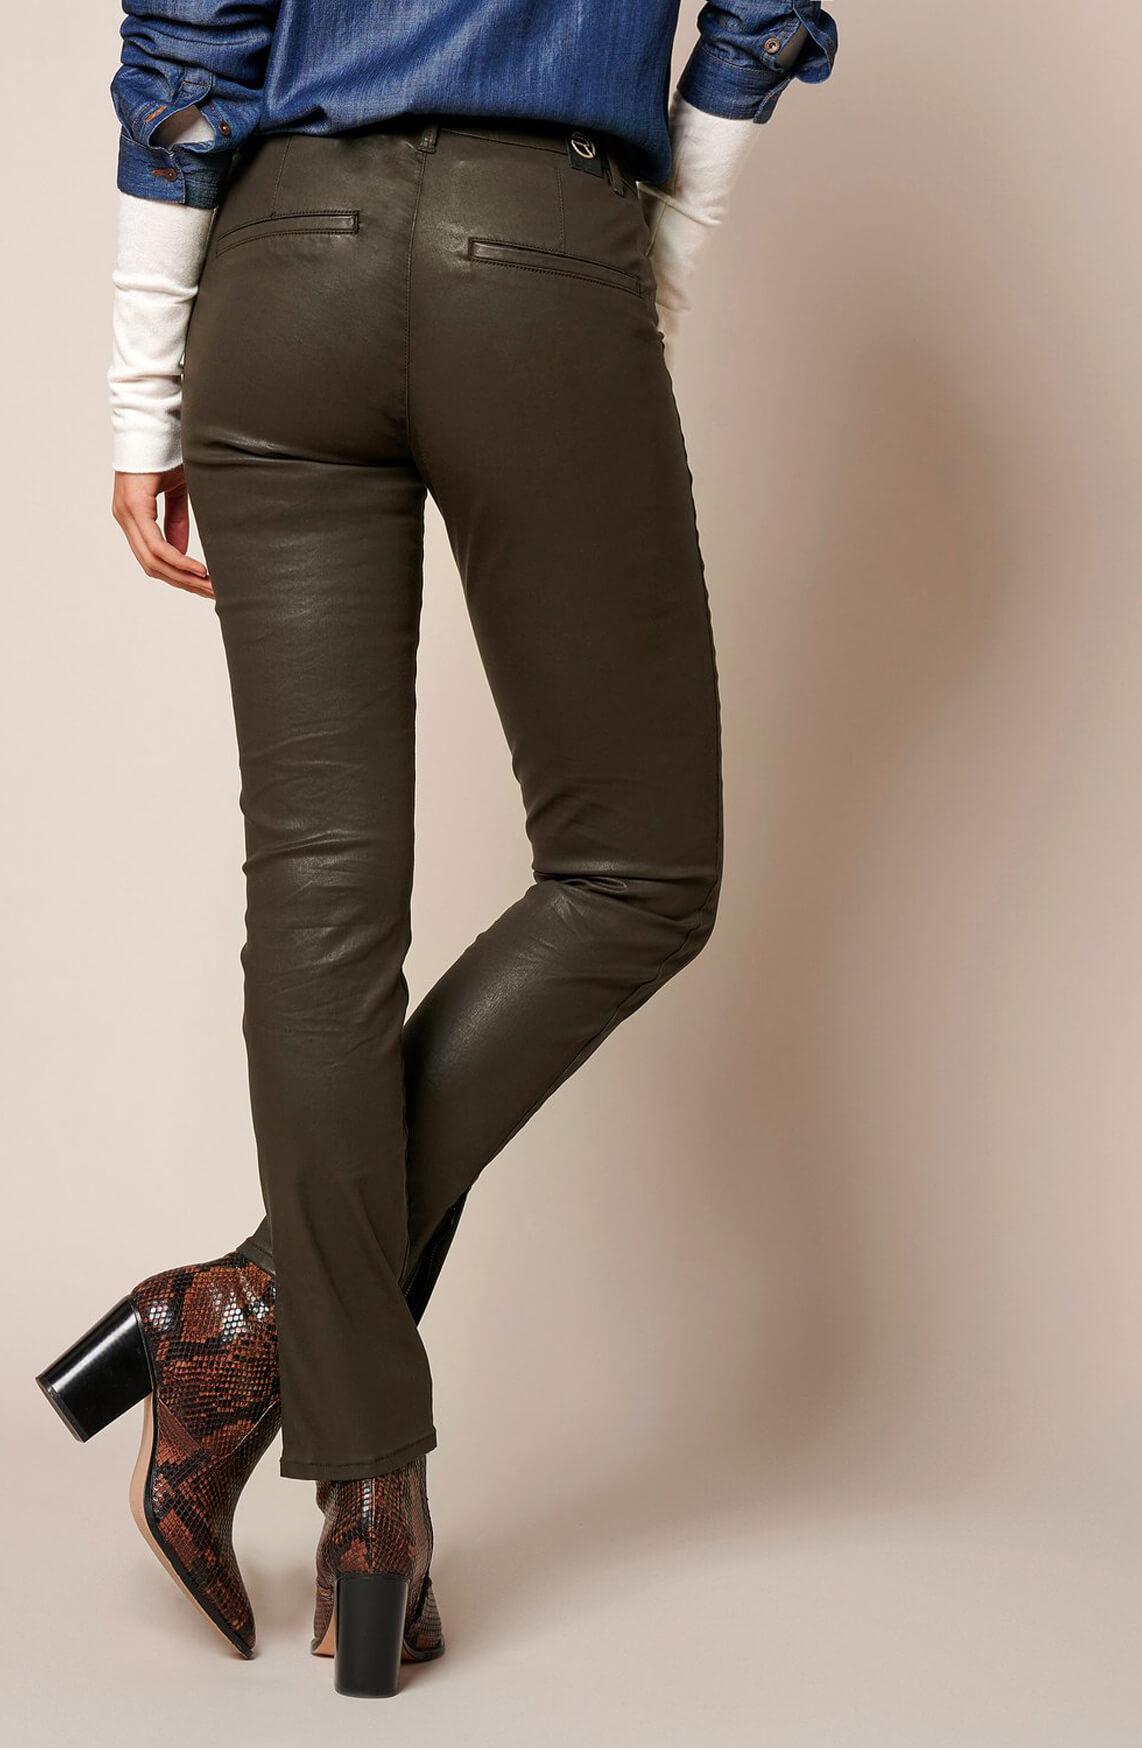 Rosner Dames L30 Antonia gecoate broek groen